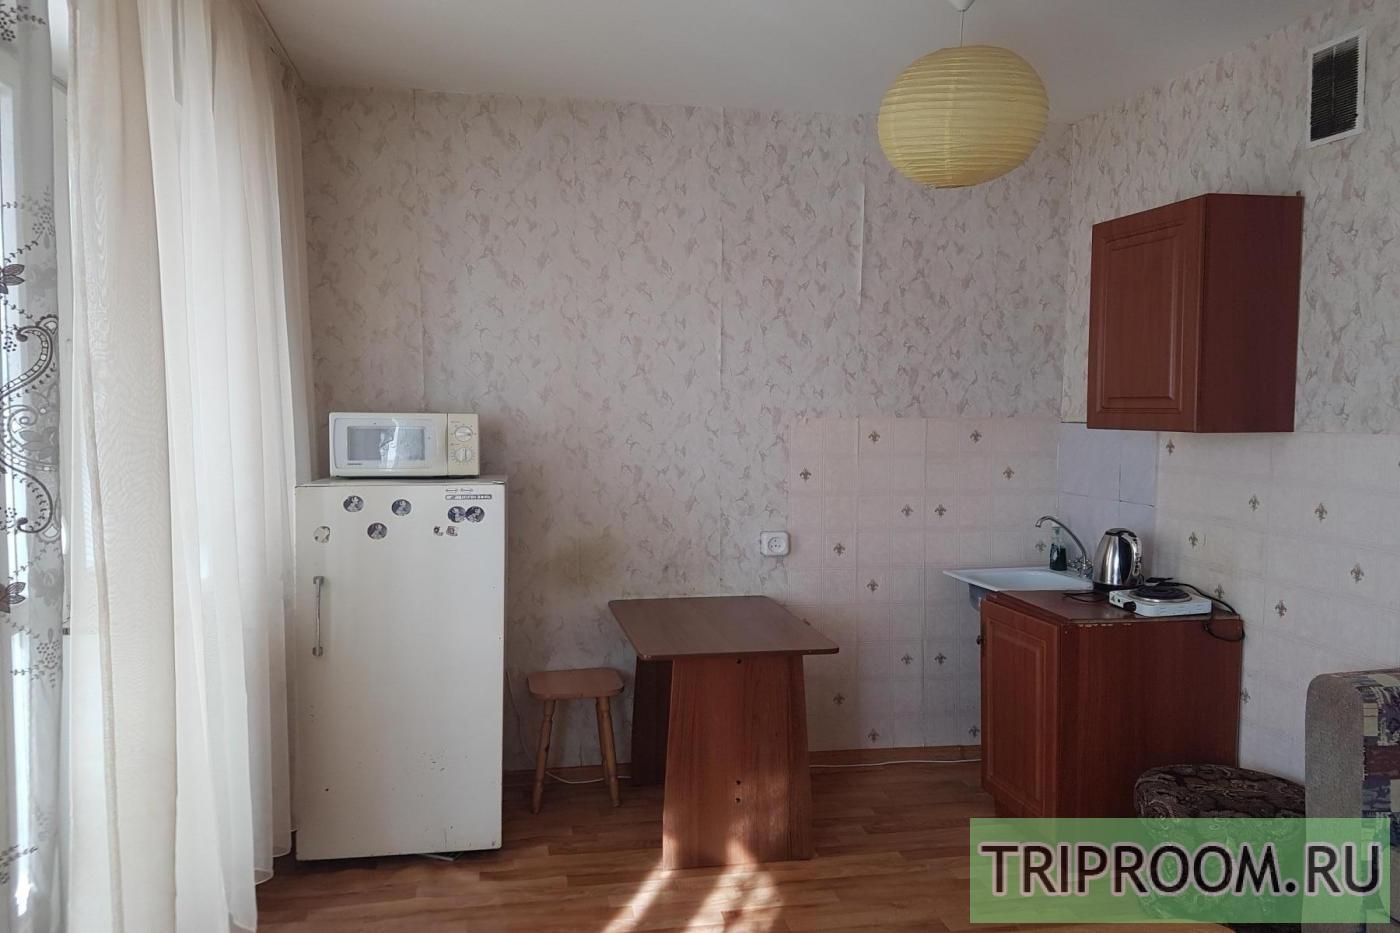 1-комнатная квартира посуточно (вариант № 34662), ул. Батурина улица, фото № 4